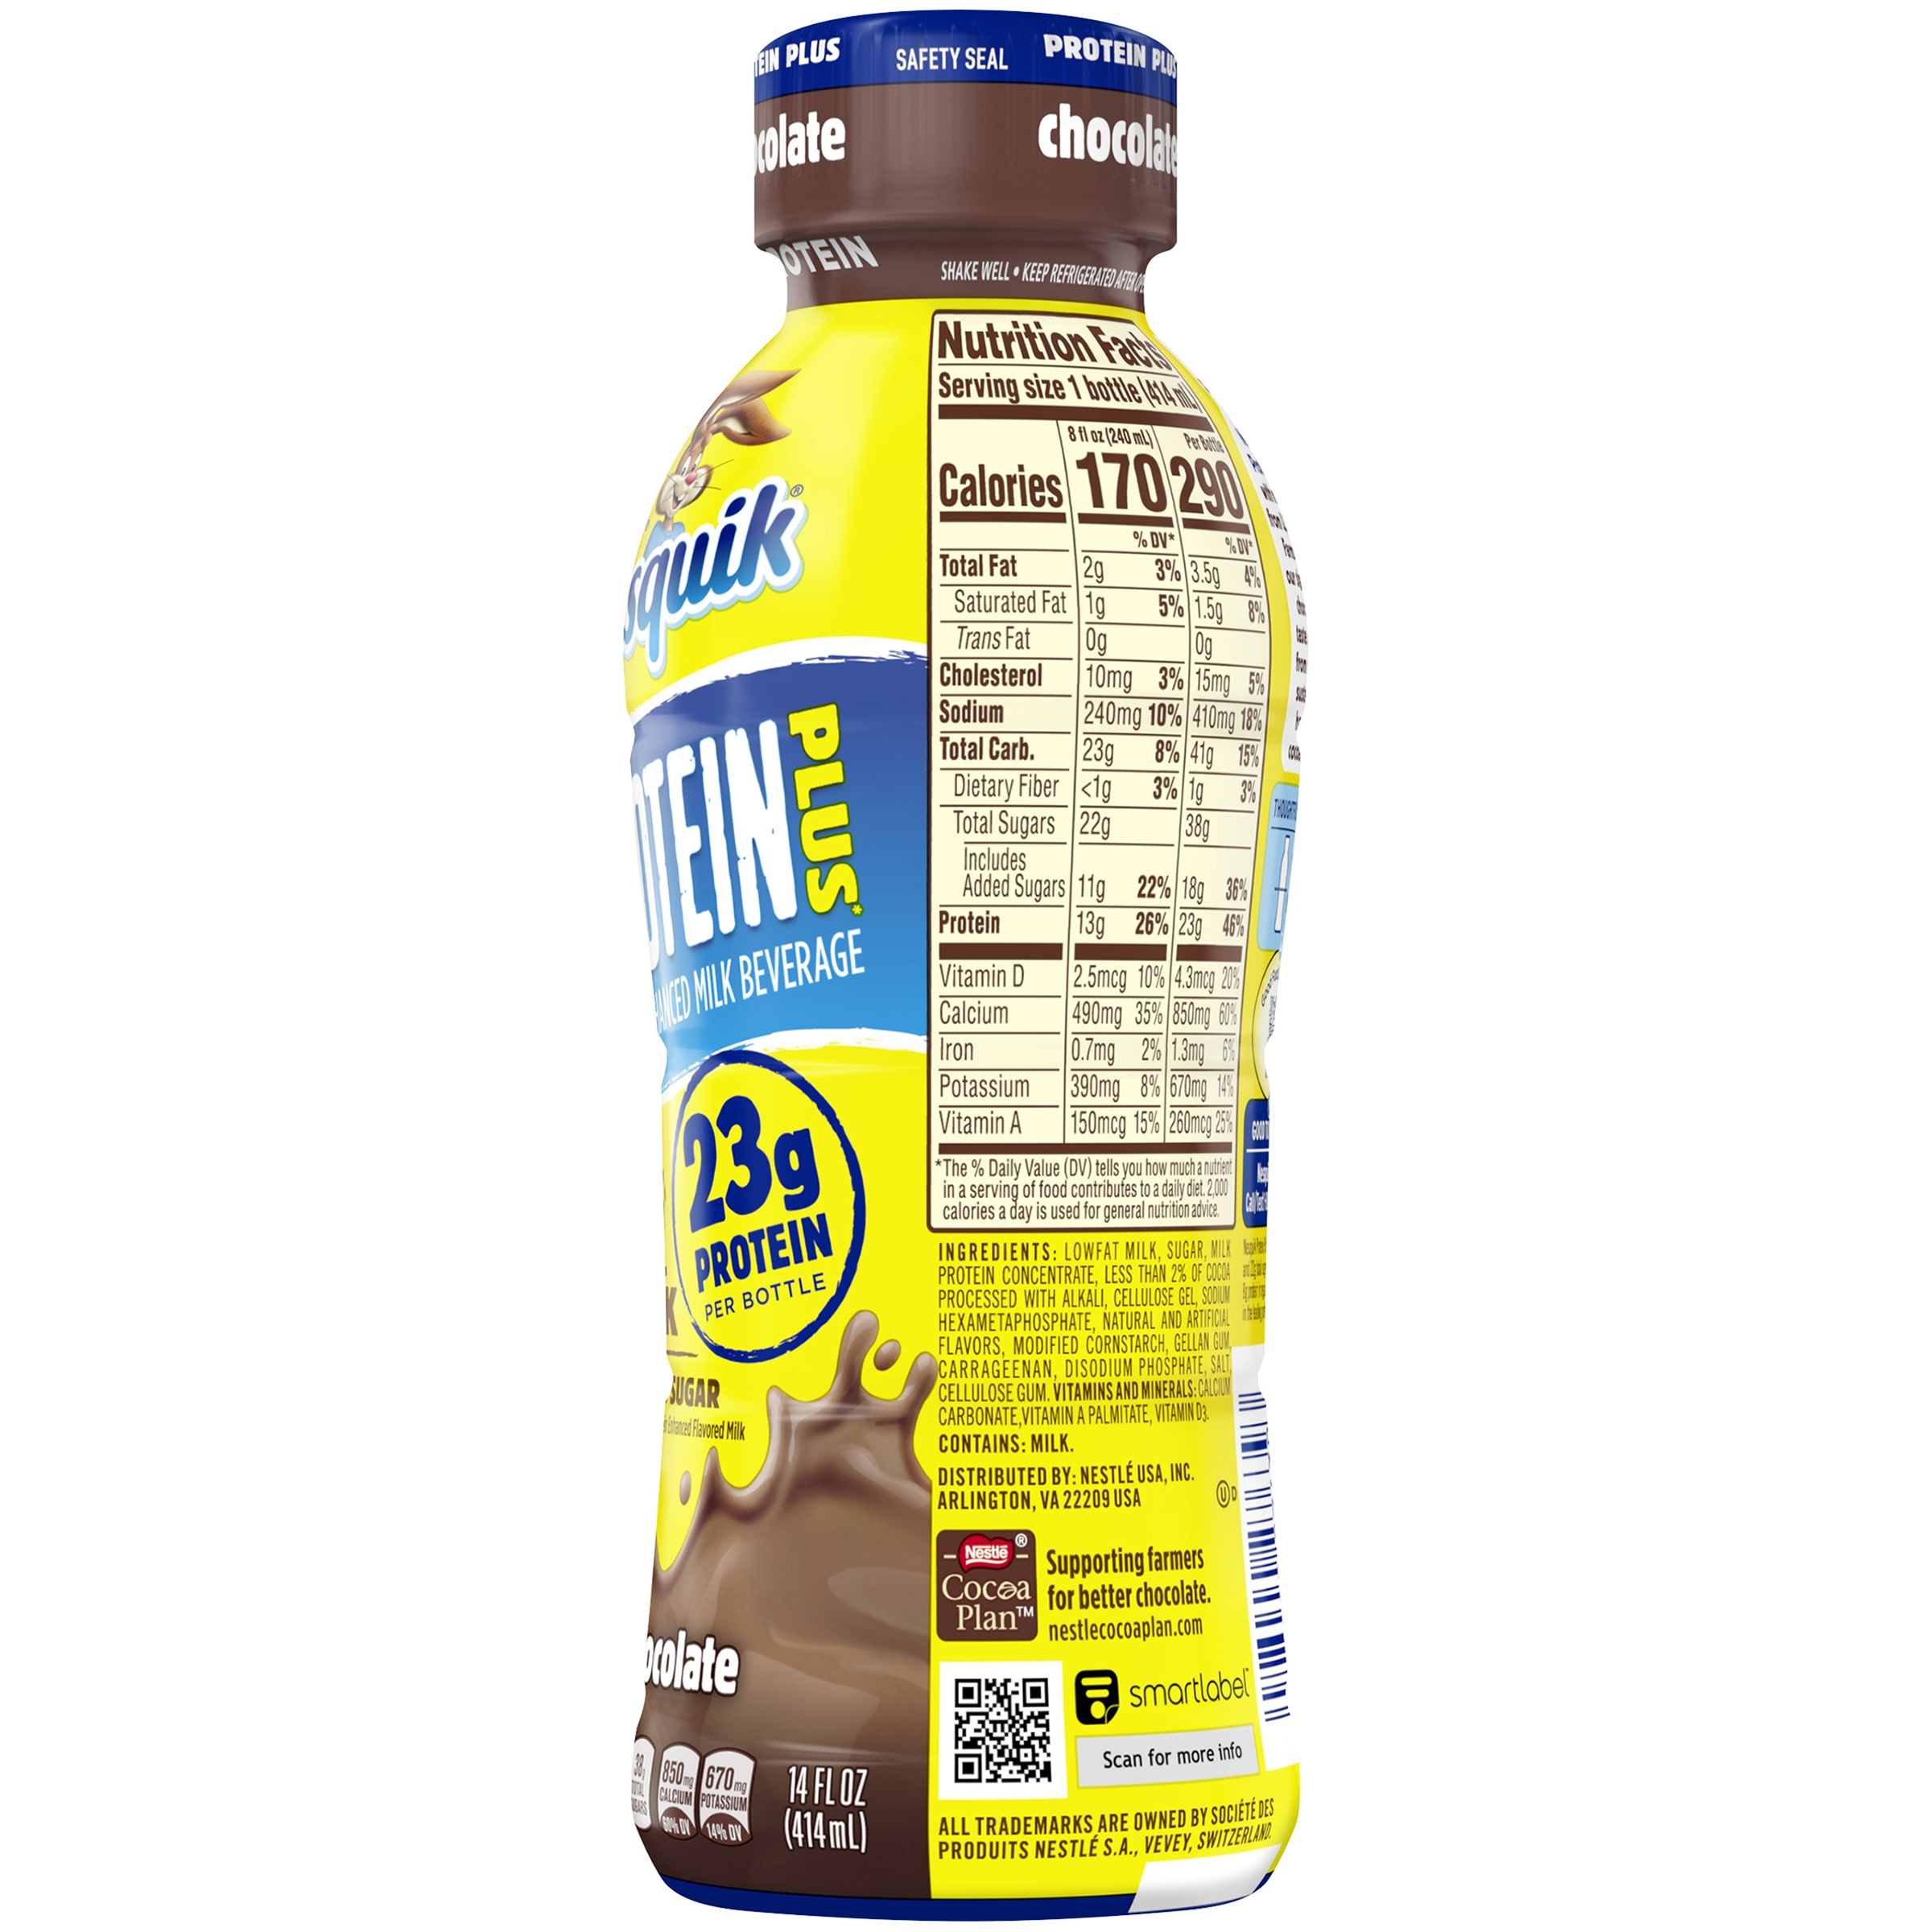 NESQUIK PROTEIN POWER Chocolate Milk 14